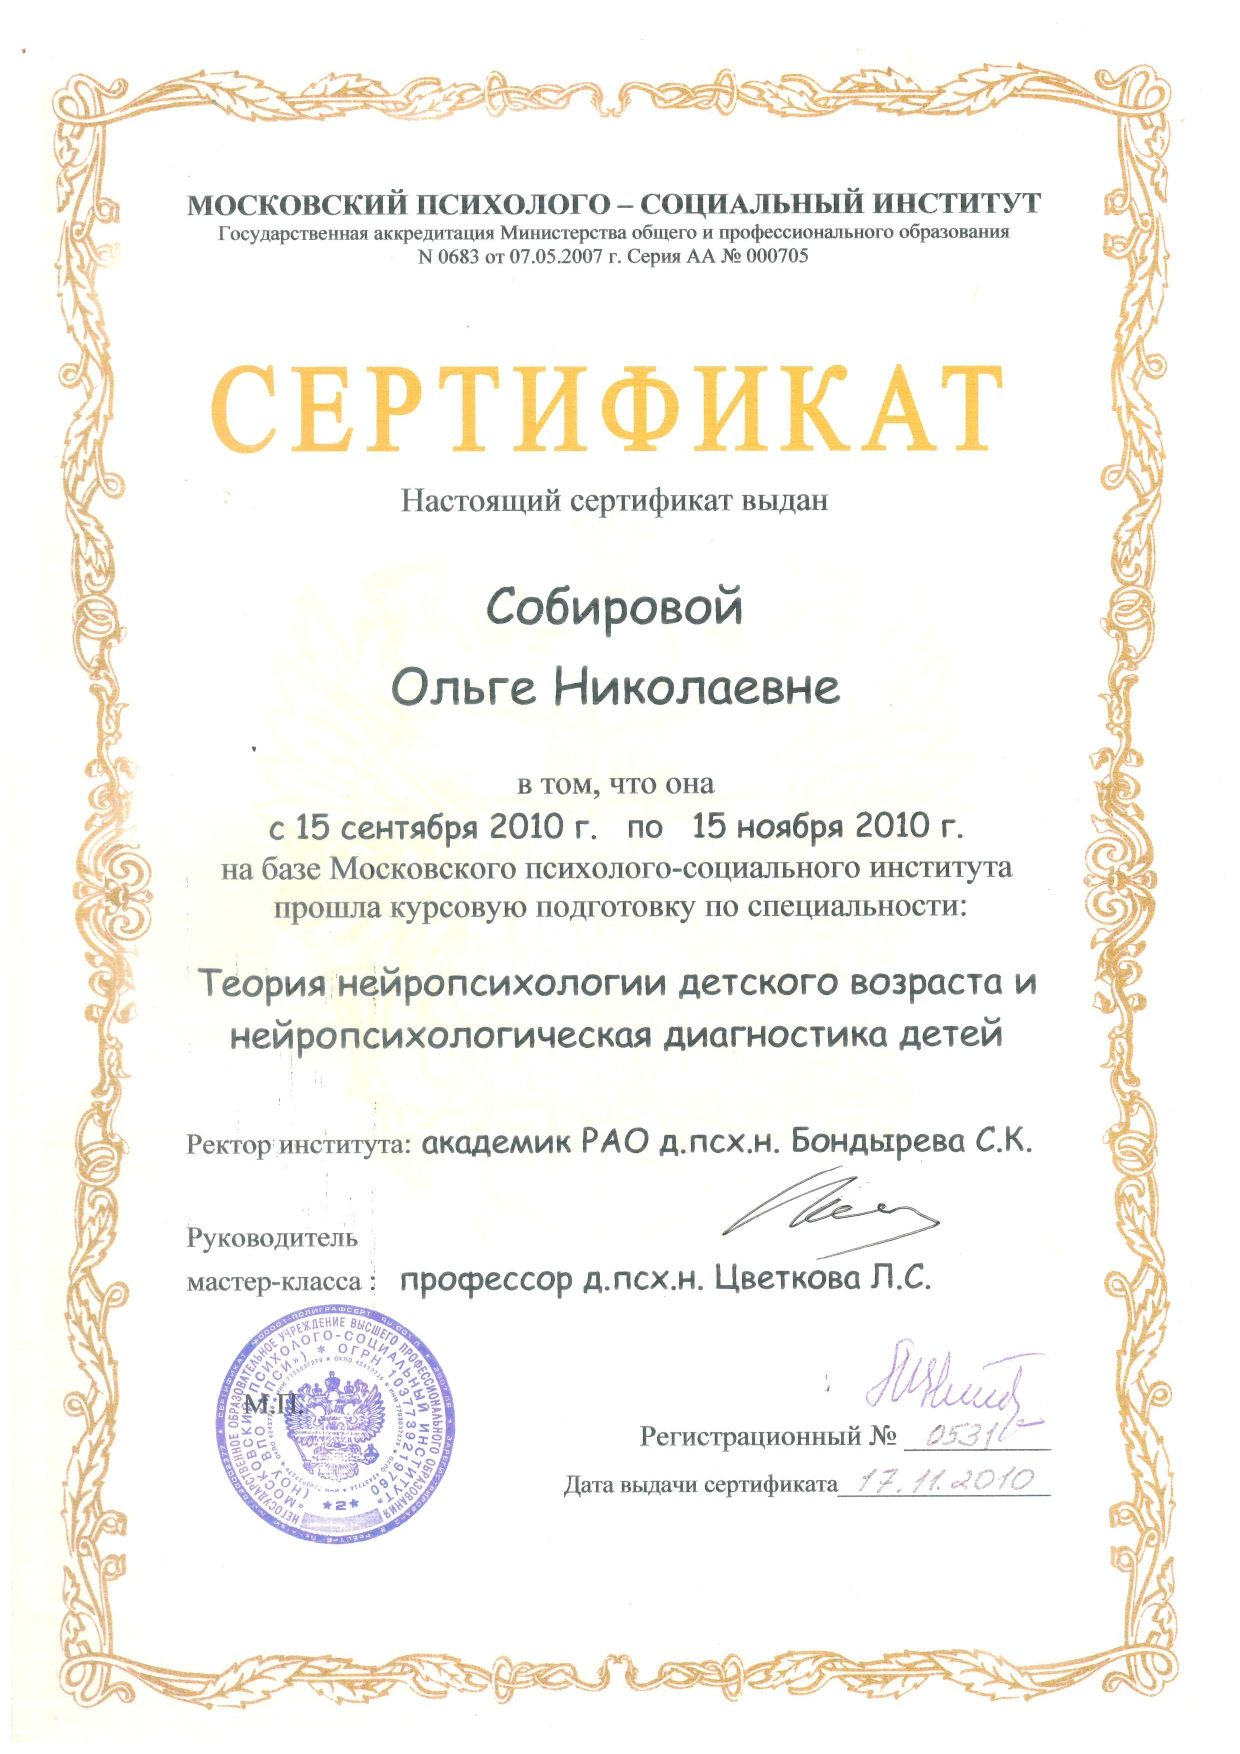 2010 Сертификат МПСИ Нейродиагностика